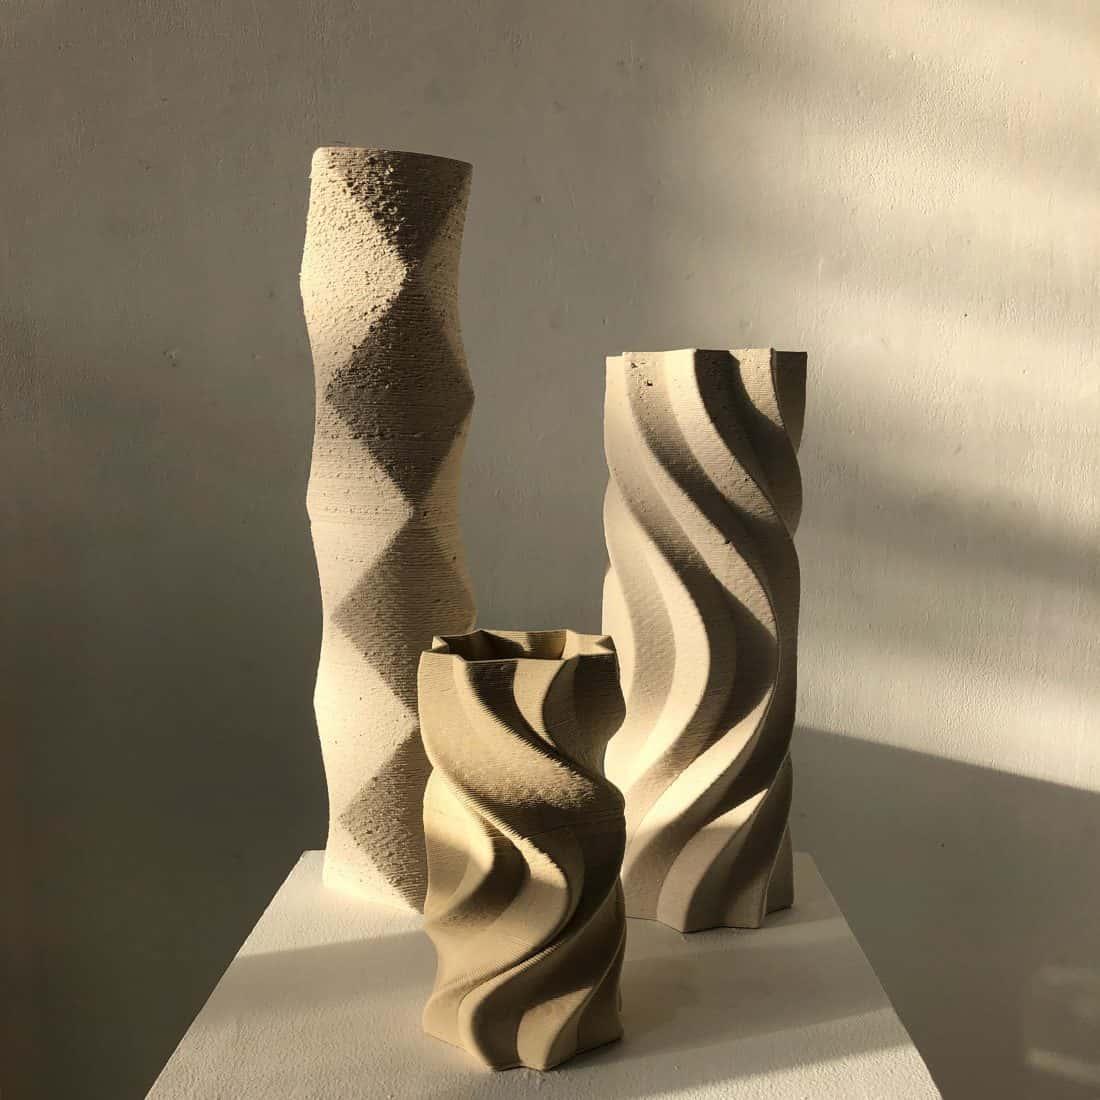 Jess Wright Glass and Ceramics Tile